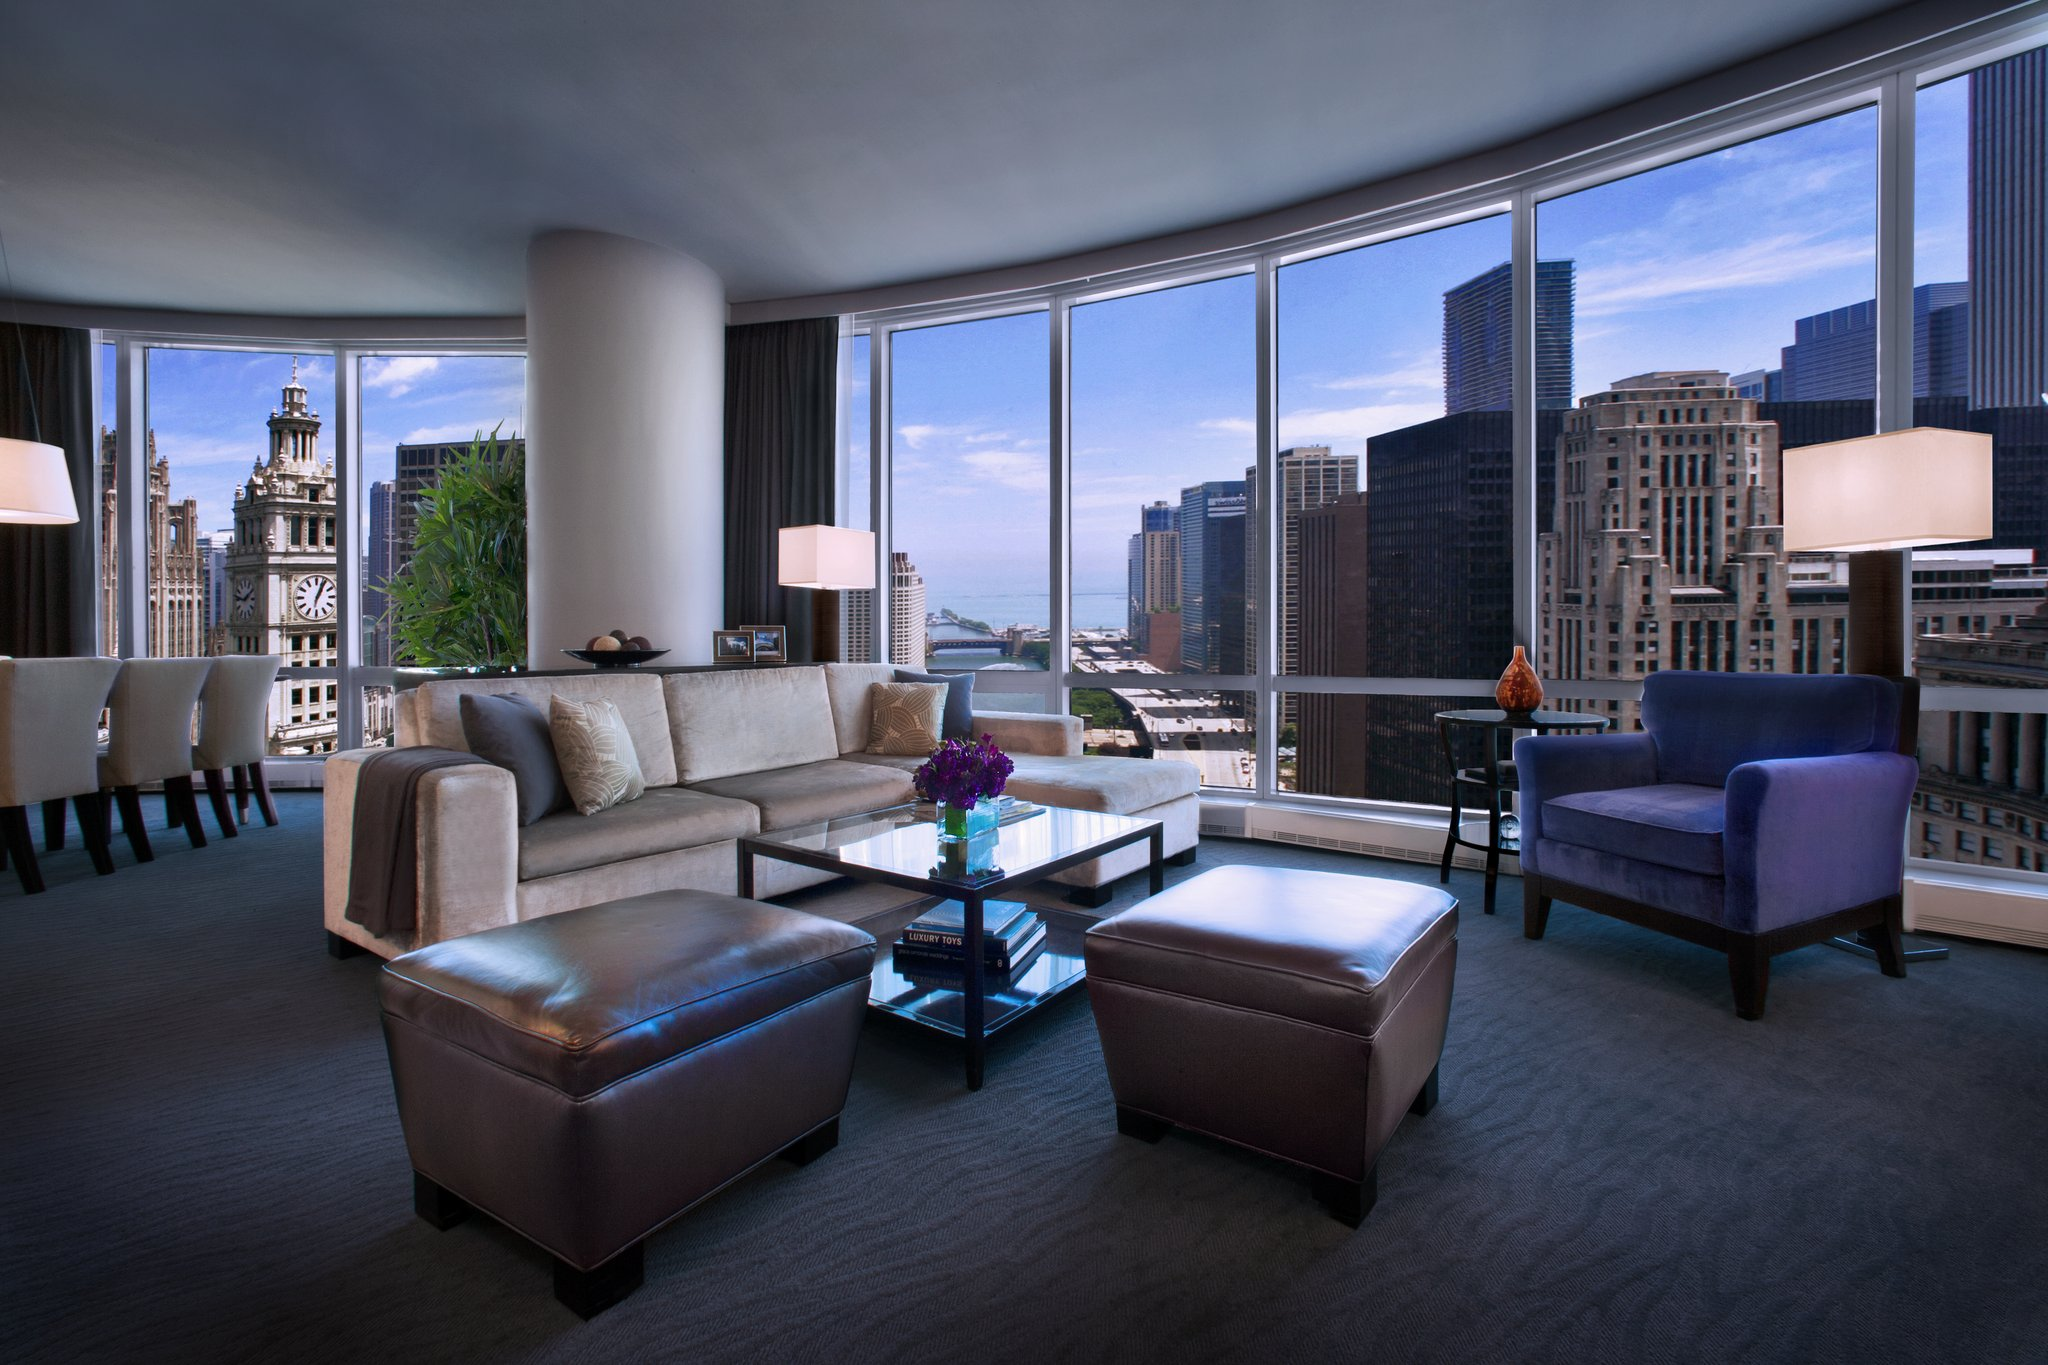 2 bedroom hotel suites in downtown chicago two bedroom